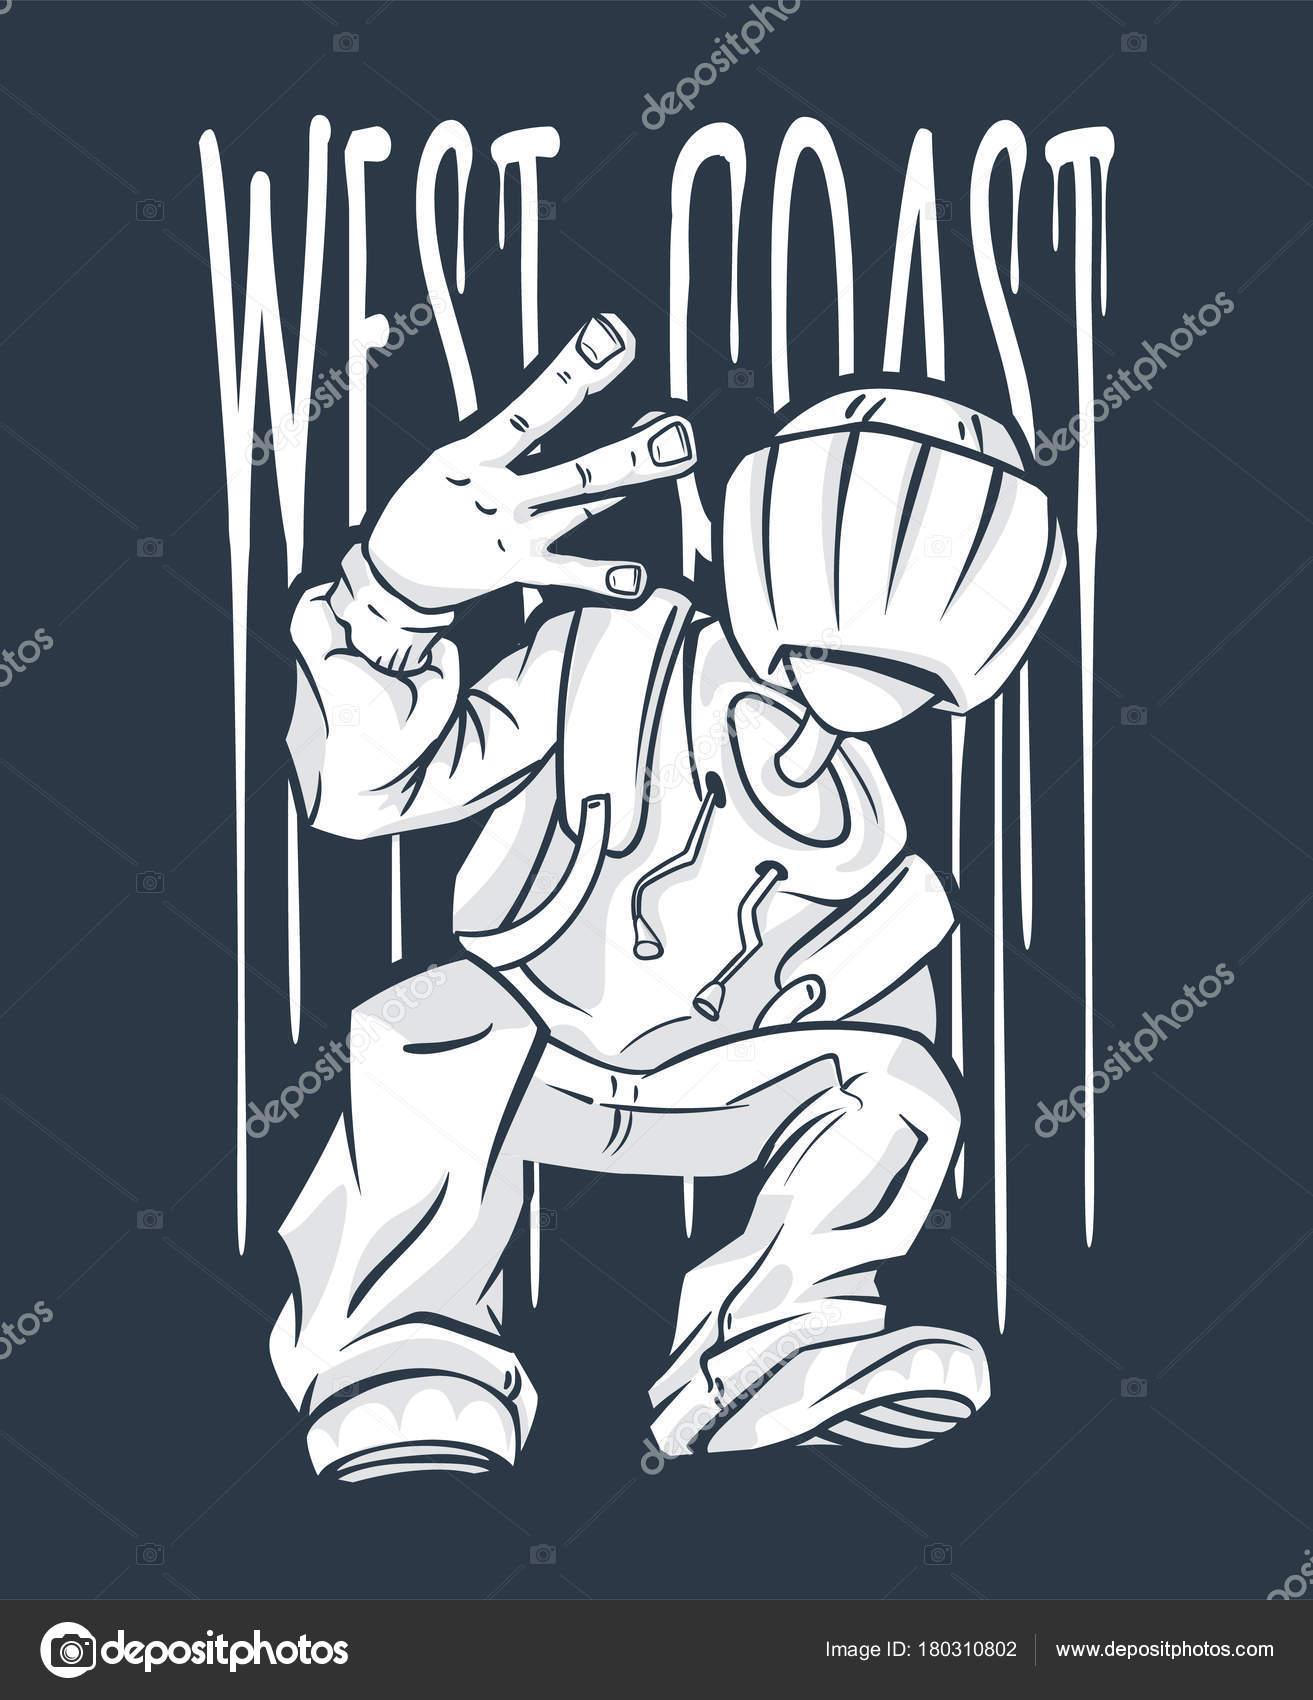 West coast hand sign | West Coast Guy Hip-Hop hand gesture. rap sign. —  Stock Vector © rosdesign #180310802